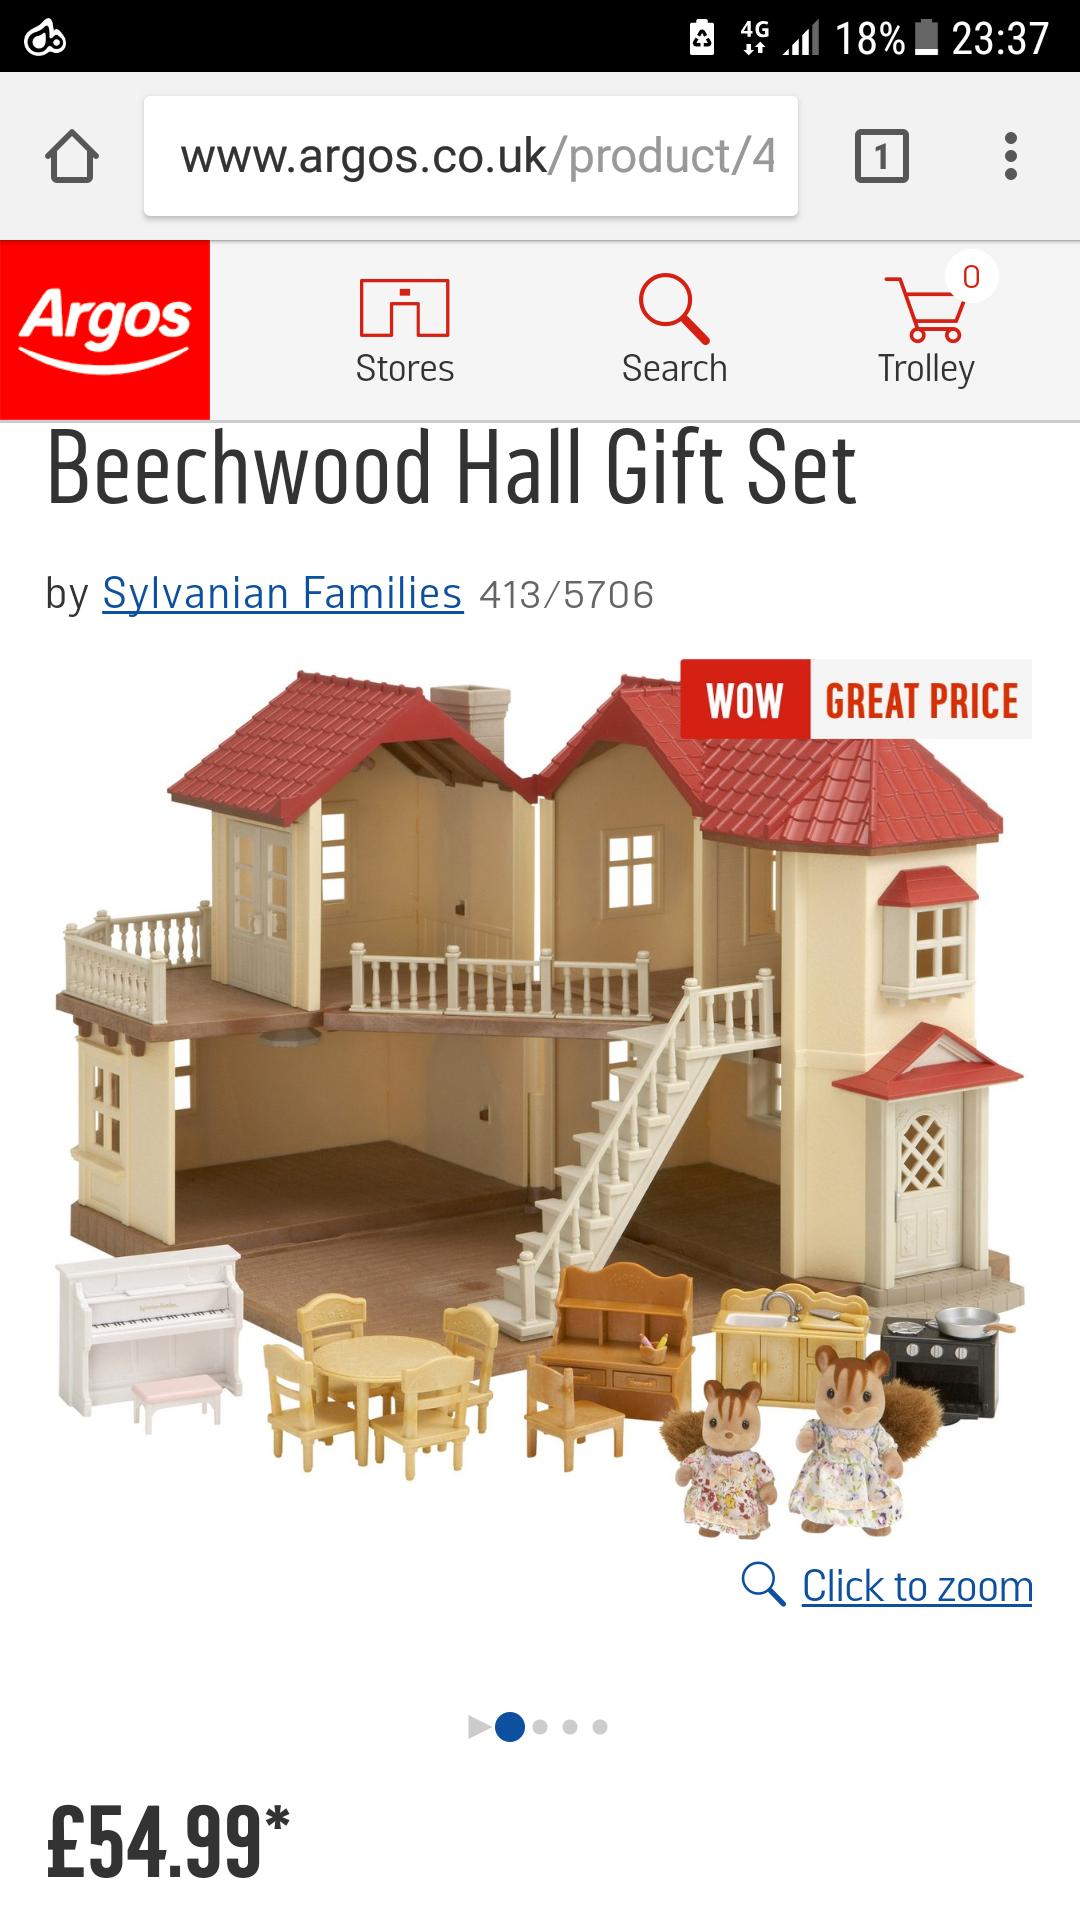 Sylvanian Families Beechwood Hall Gift Set £54.99 @ Argos